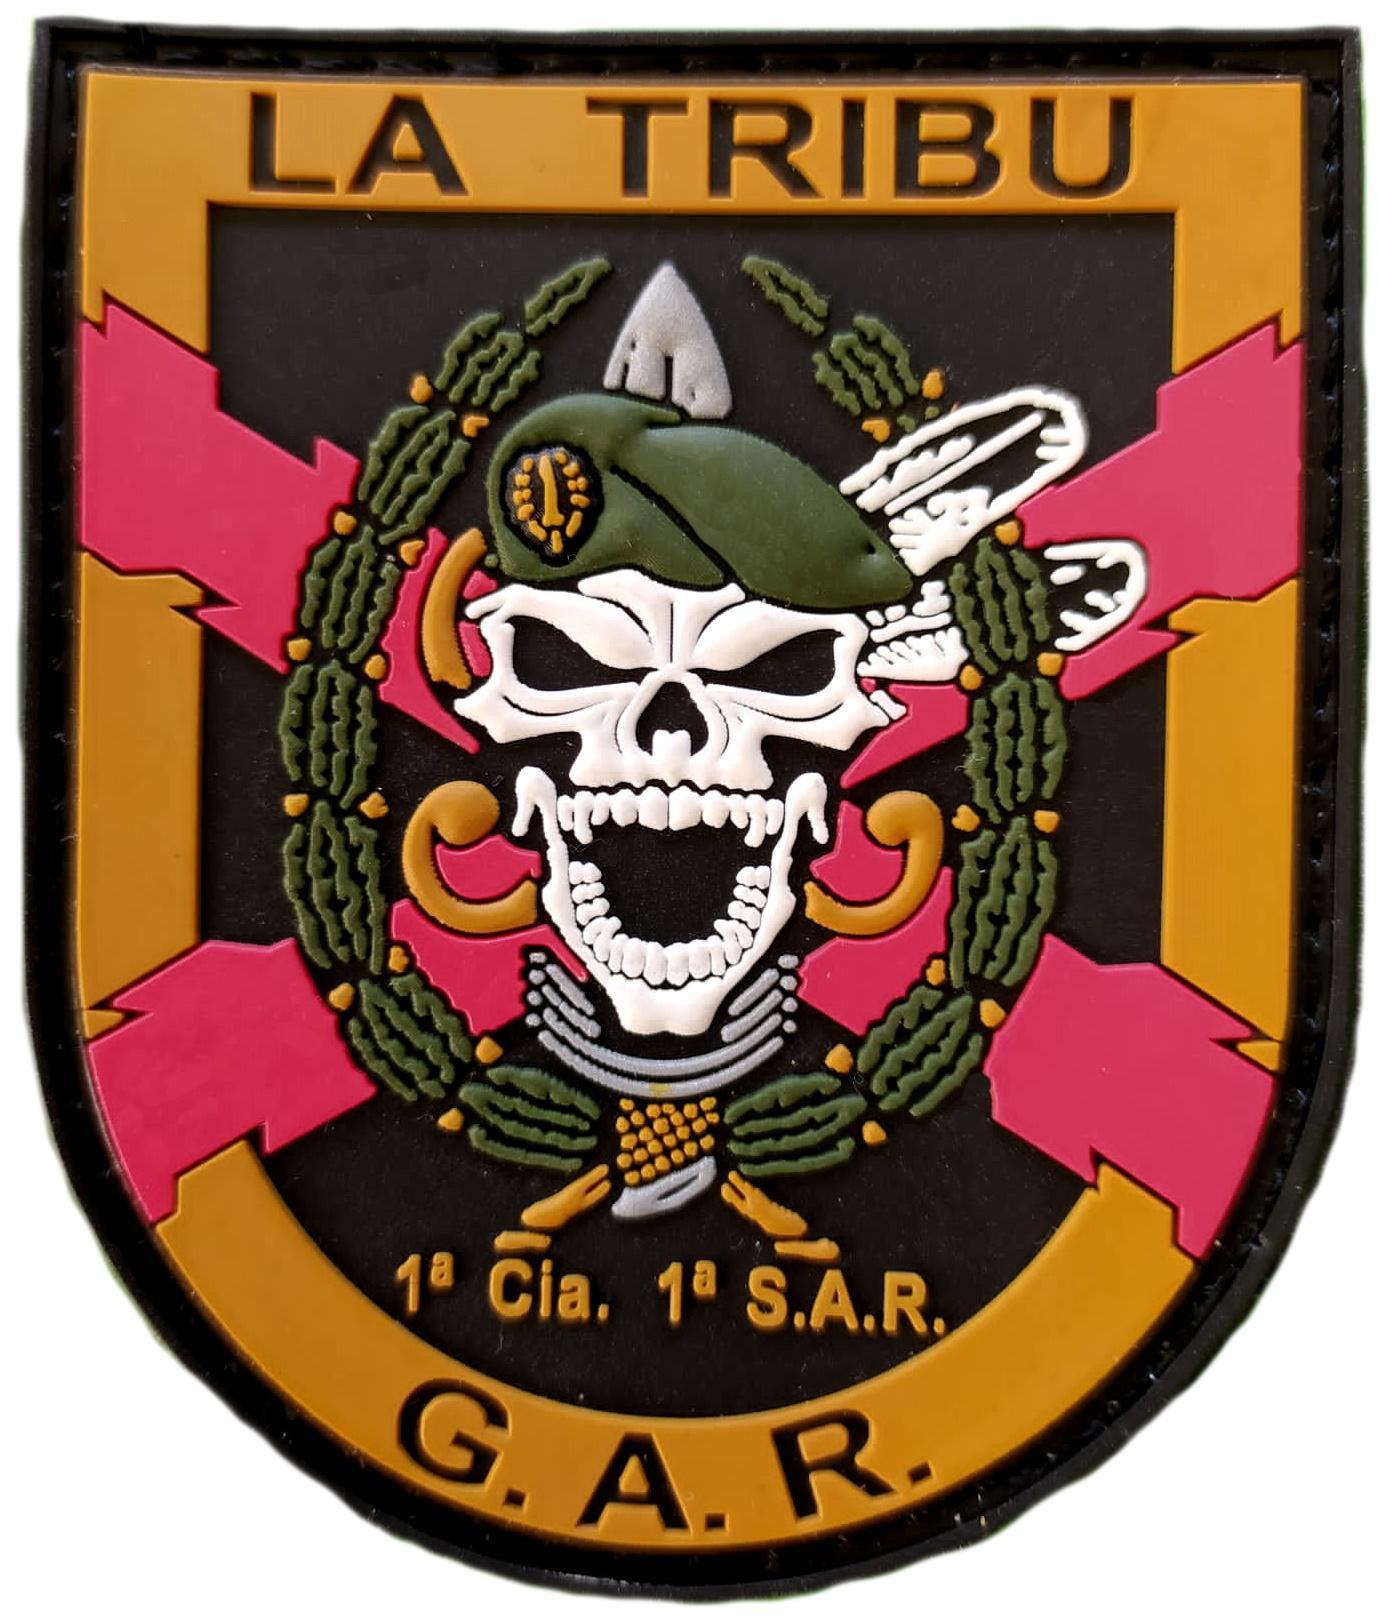 Guardia civil GAR La Tribu parche insignia emblema distintivo